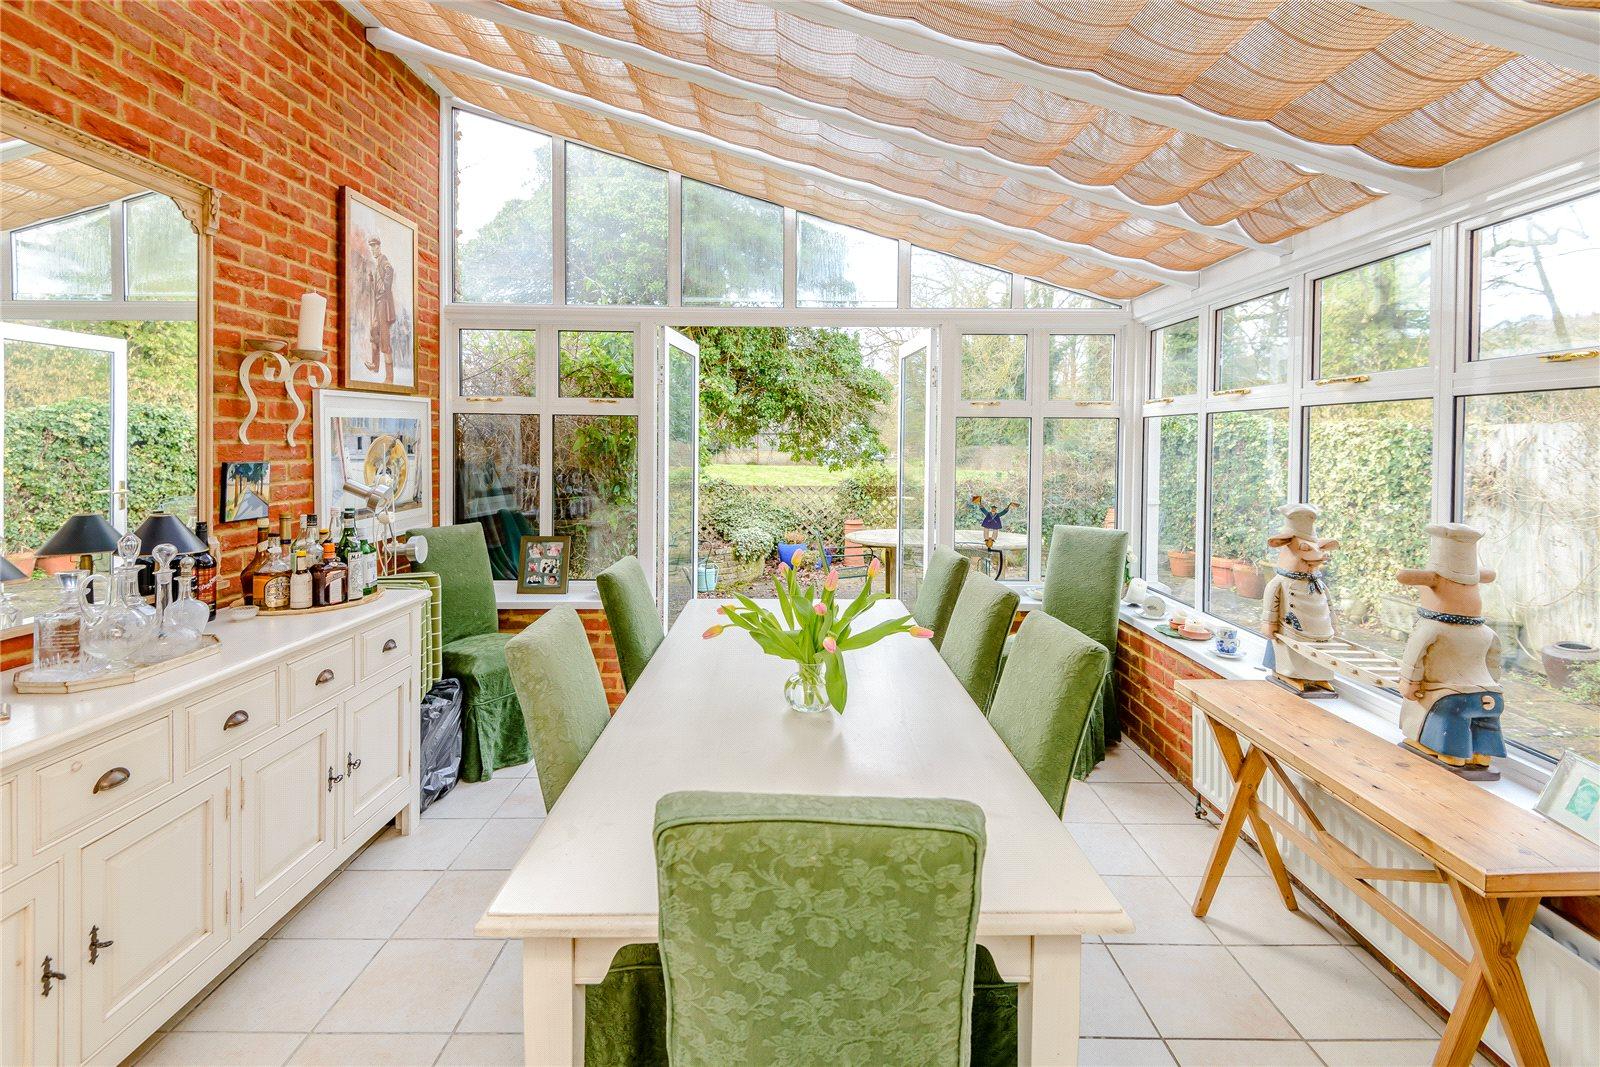 独户住宅 为 销售 在 Archery Place, Gomshall, Guildford, Surrey, GU5 Guildford, 英格兰